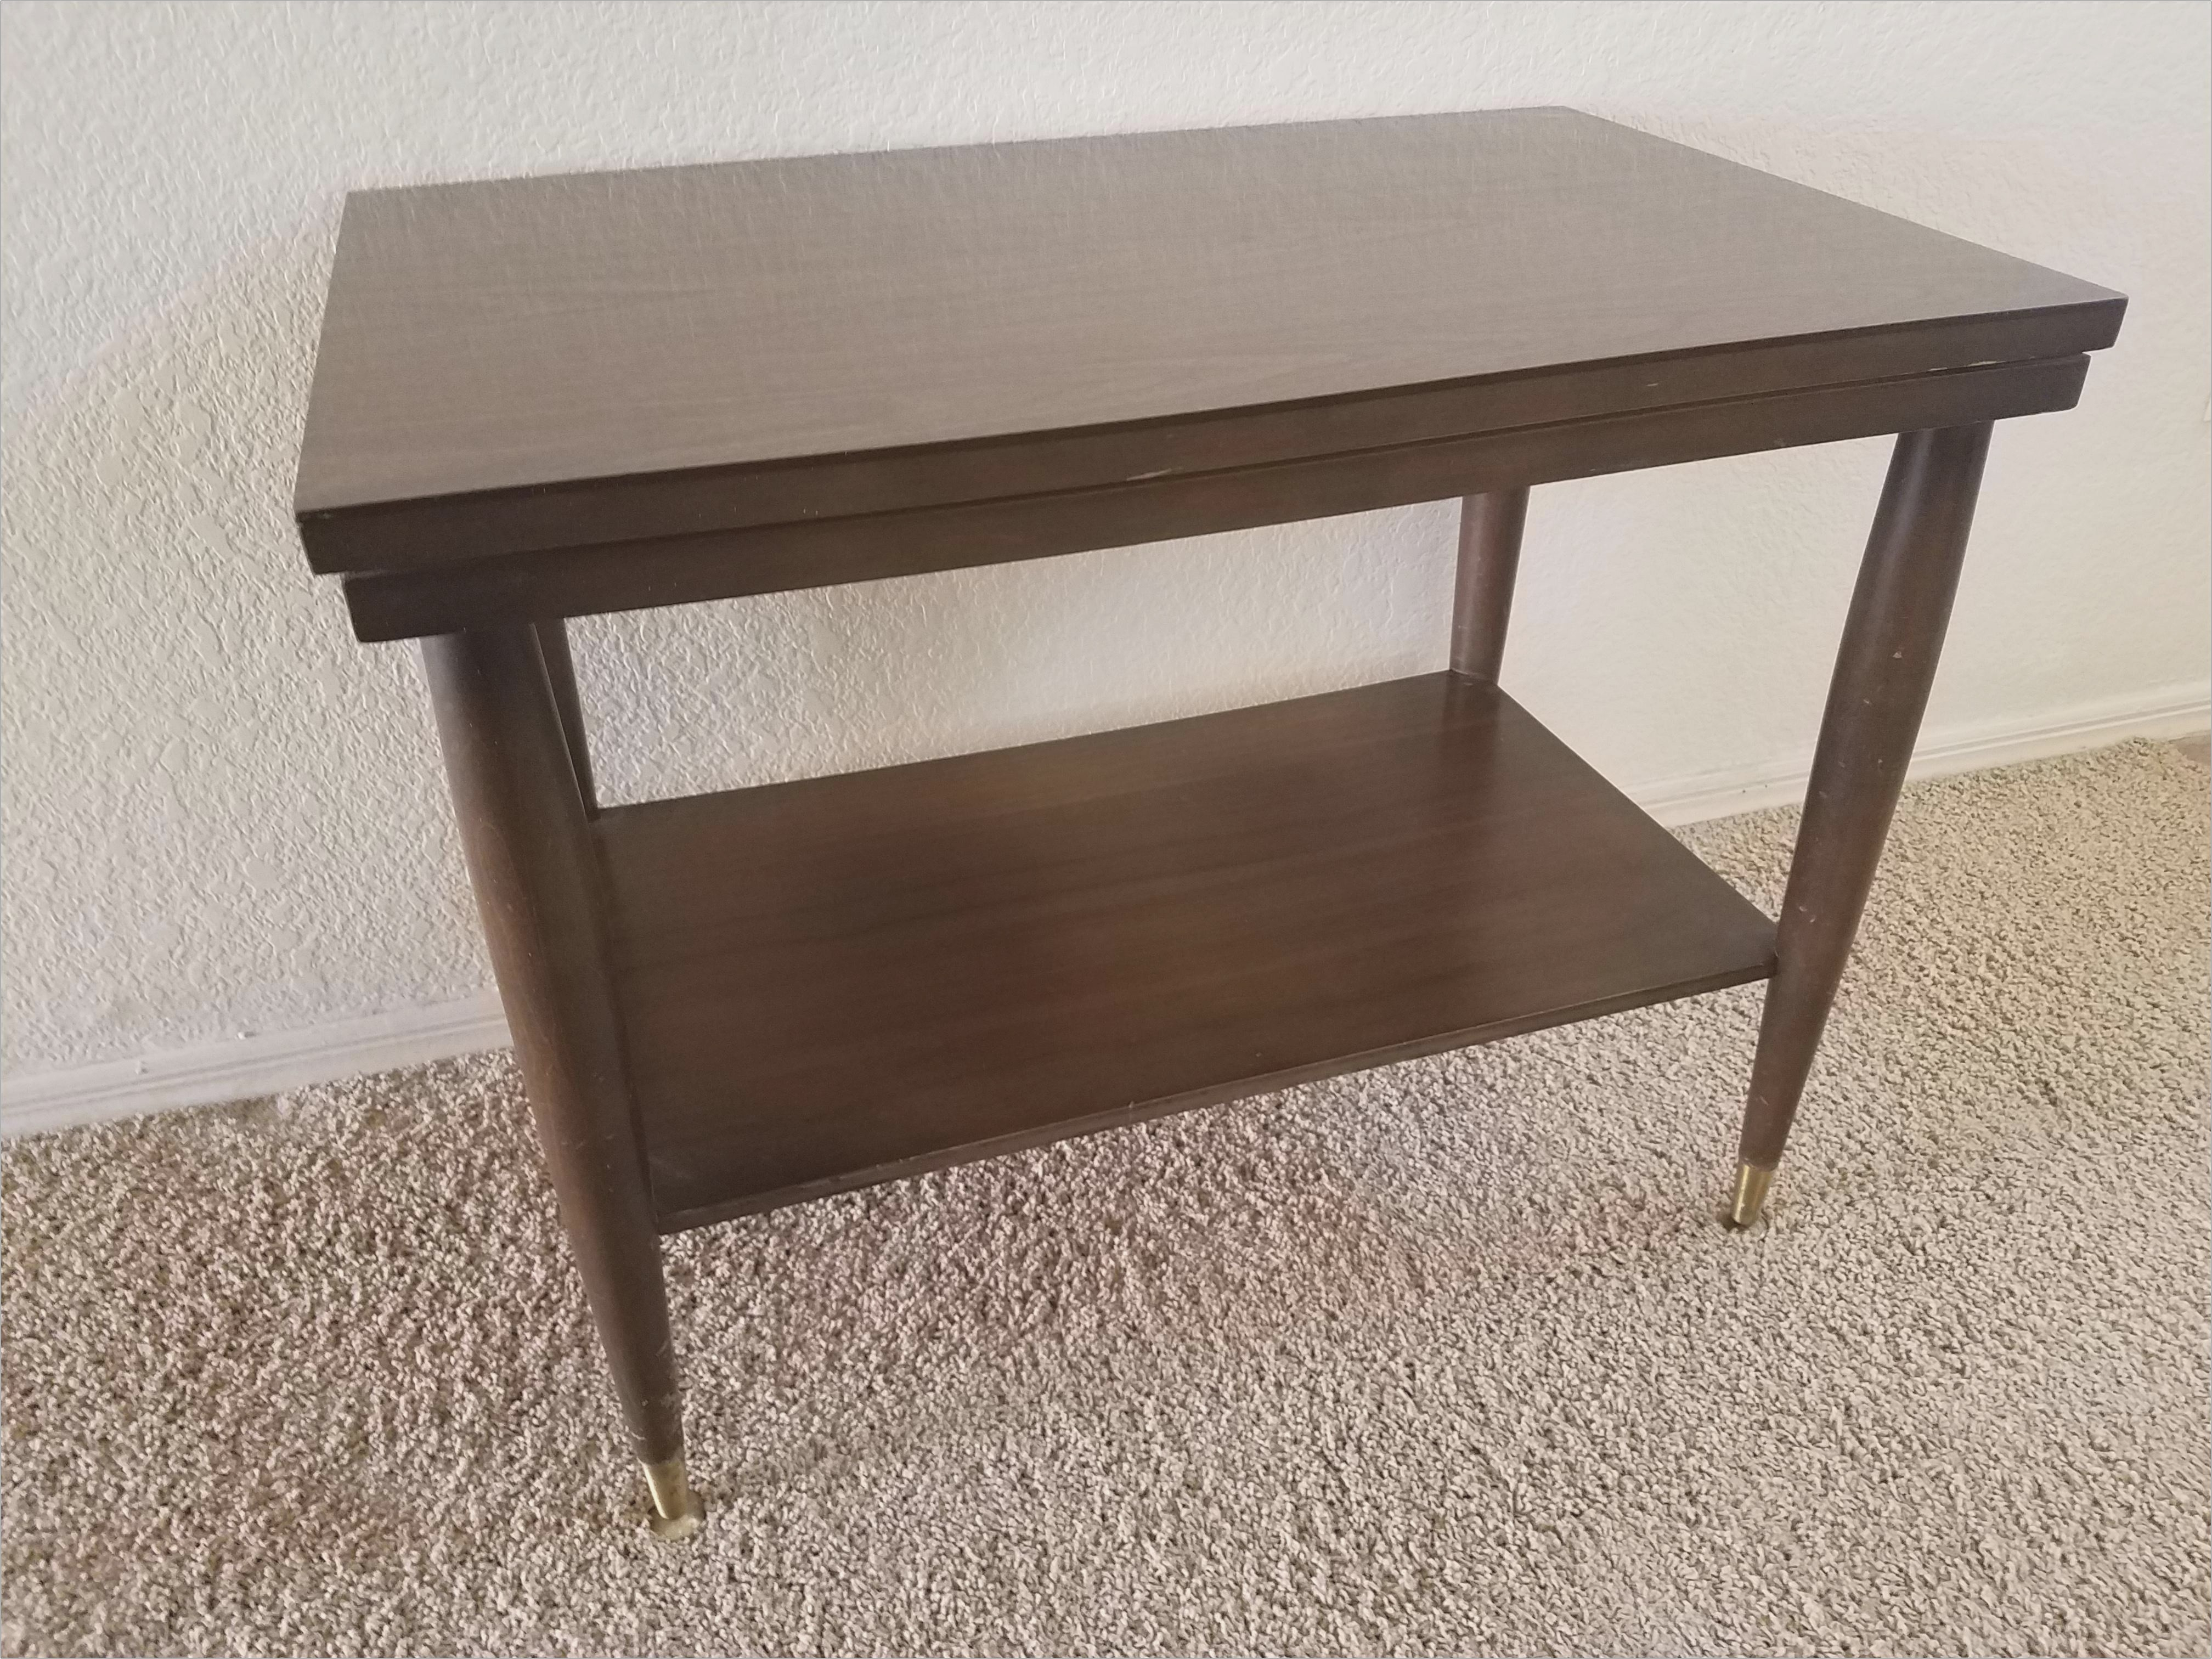 Diy Coffee Table Ideas 12 Diy Wood Coffee Table Ideas Pics